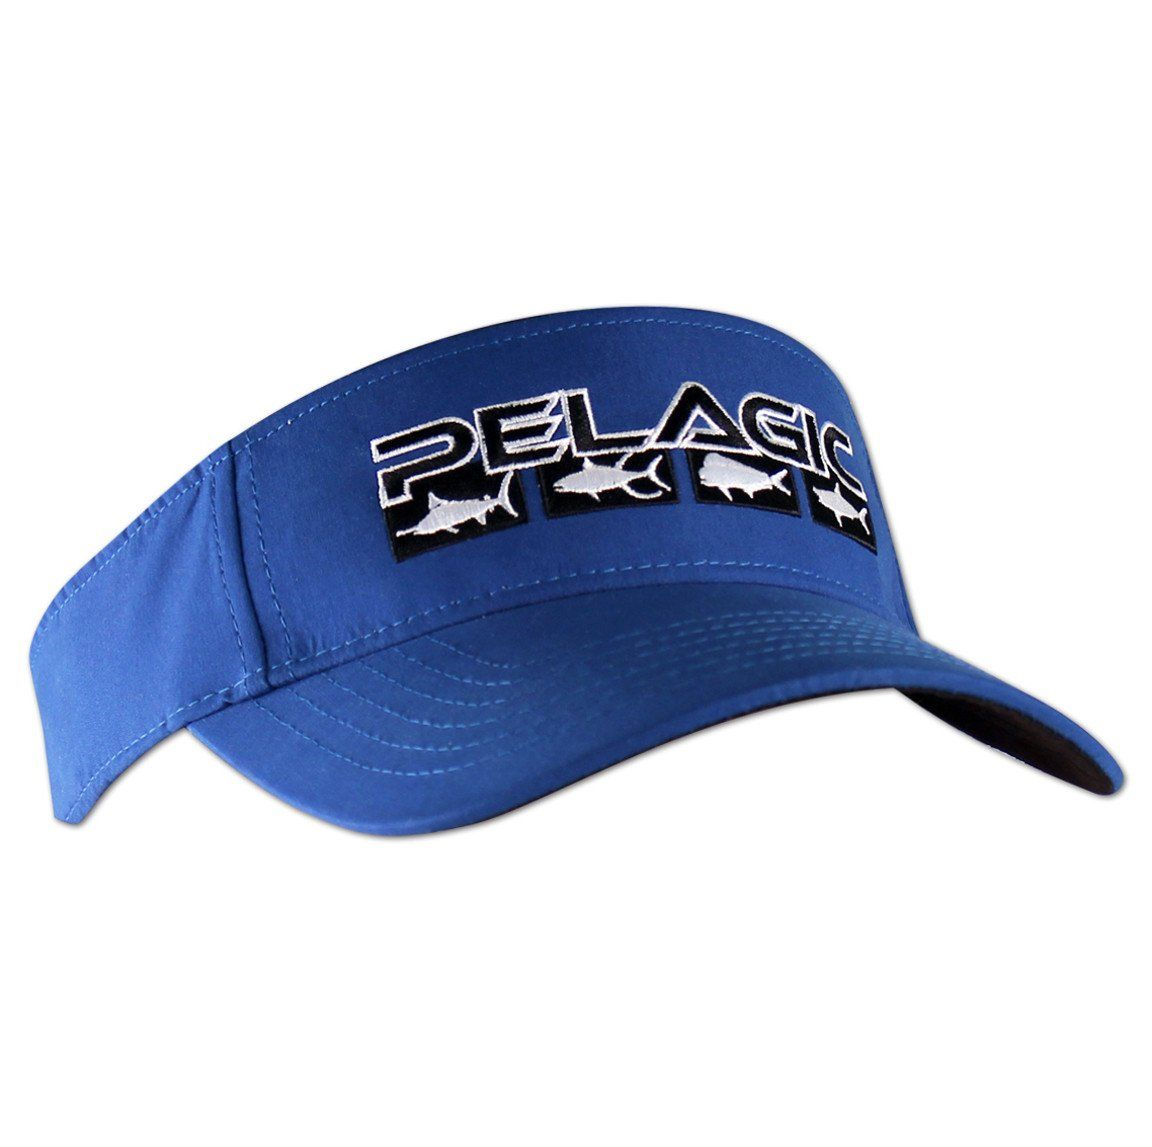 957ada7d80b Gone Fishing. Pelagic - Fish Flag Visor-Royal Visor Hats